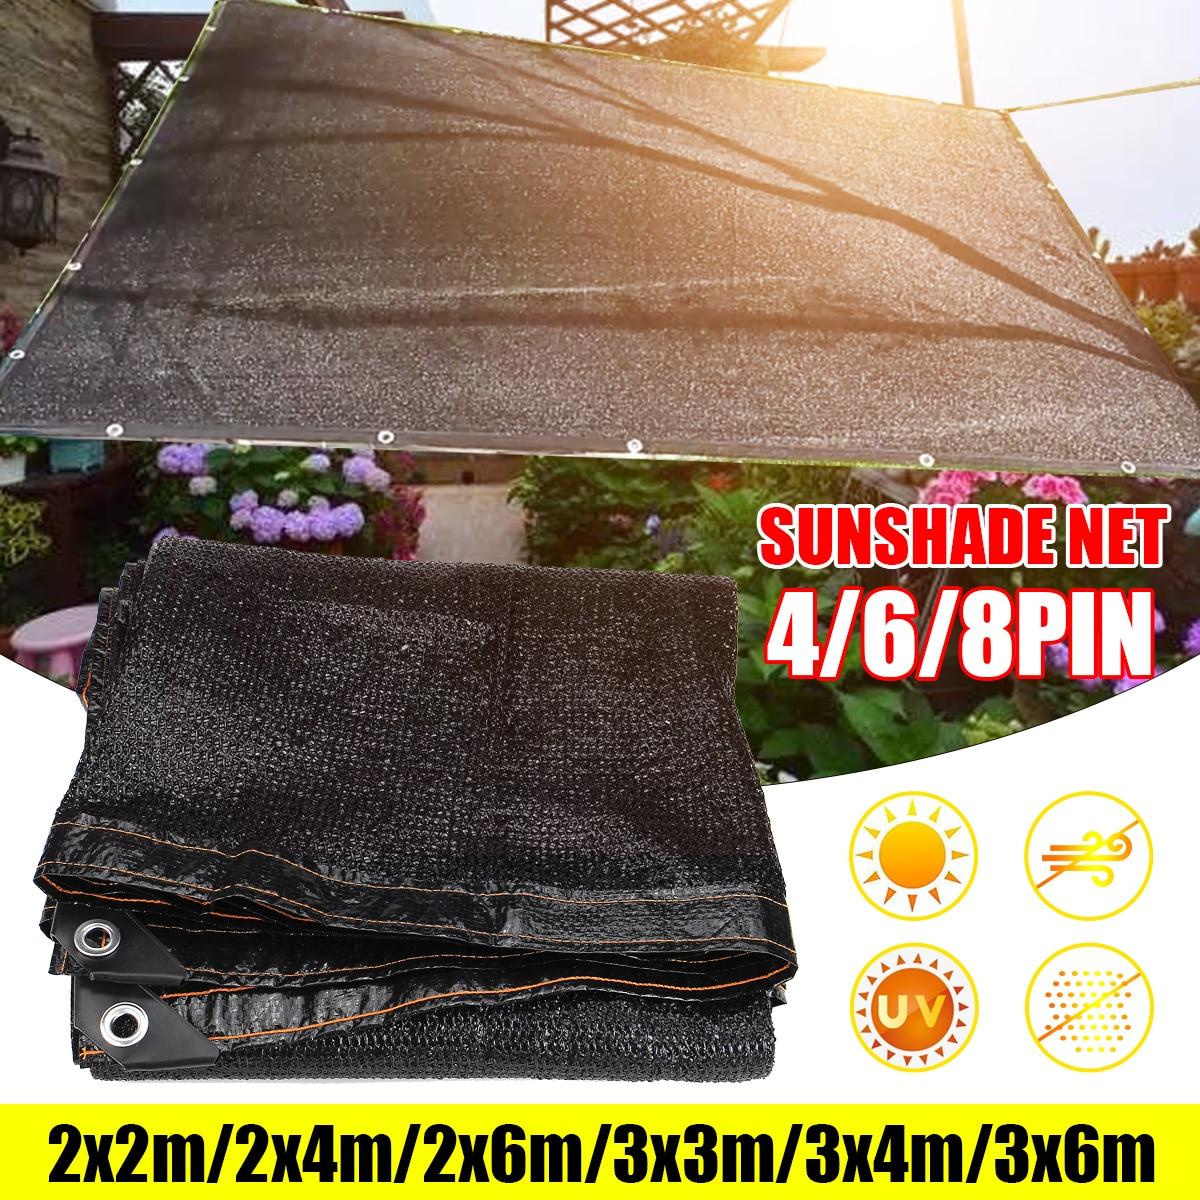 Sunshade Net Anti-UV 85% Shading Rate Outdoor Garden Sunscreen Sunblock Shade Cloth Net  Plant Greenhouse Car Cover